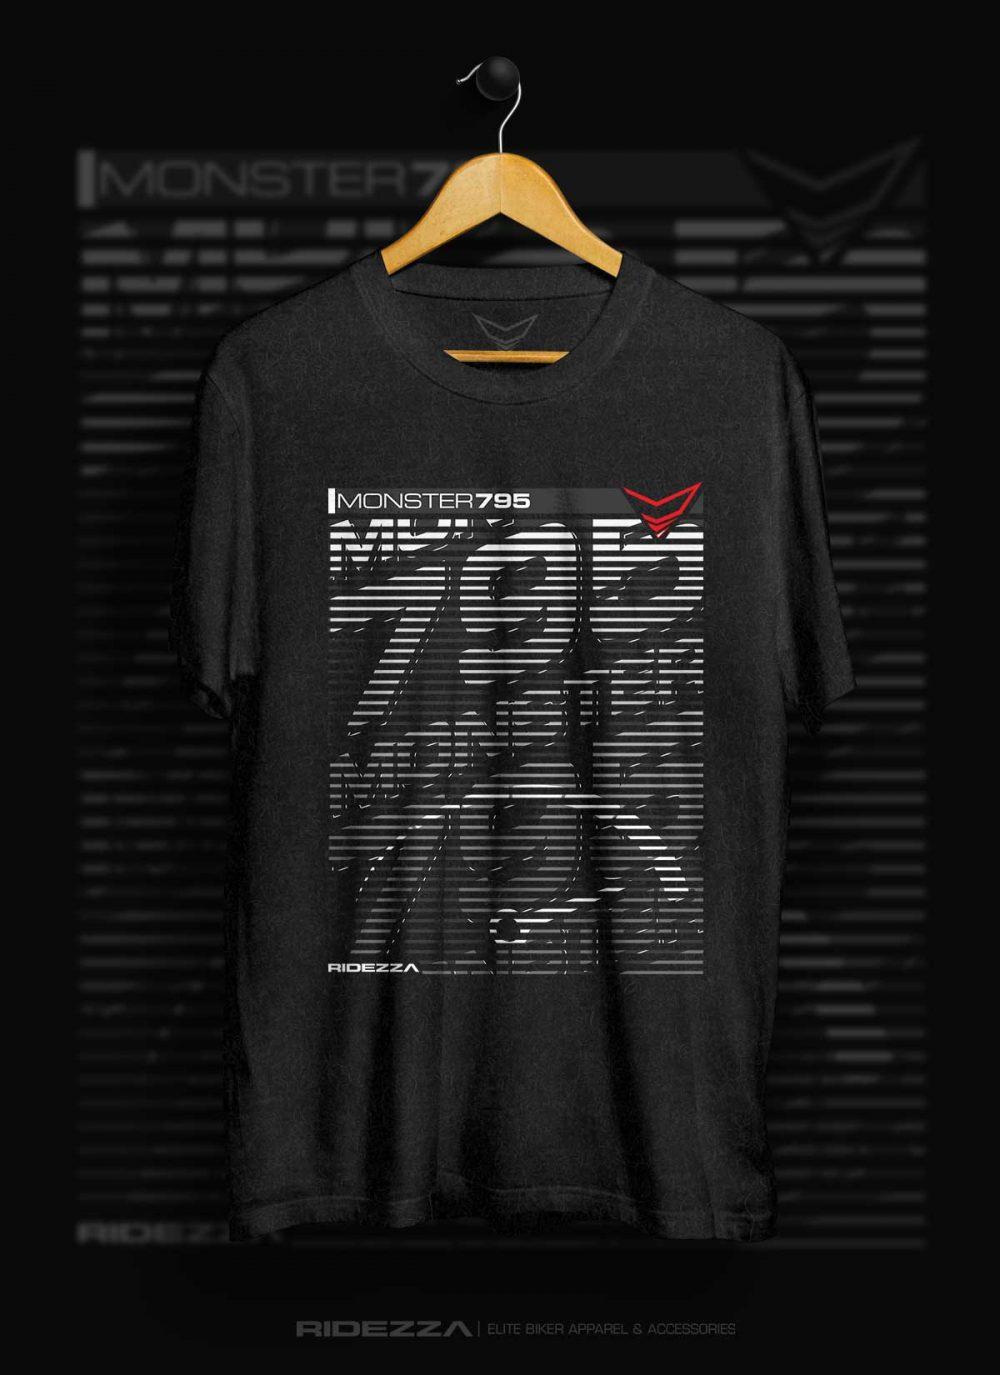 Ducati Monster 795 Speedy T-Shirt